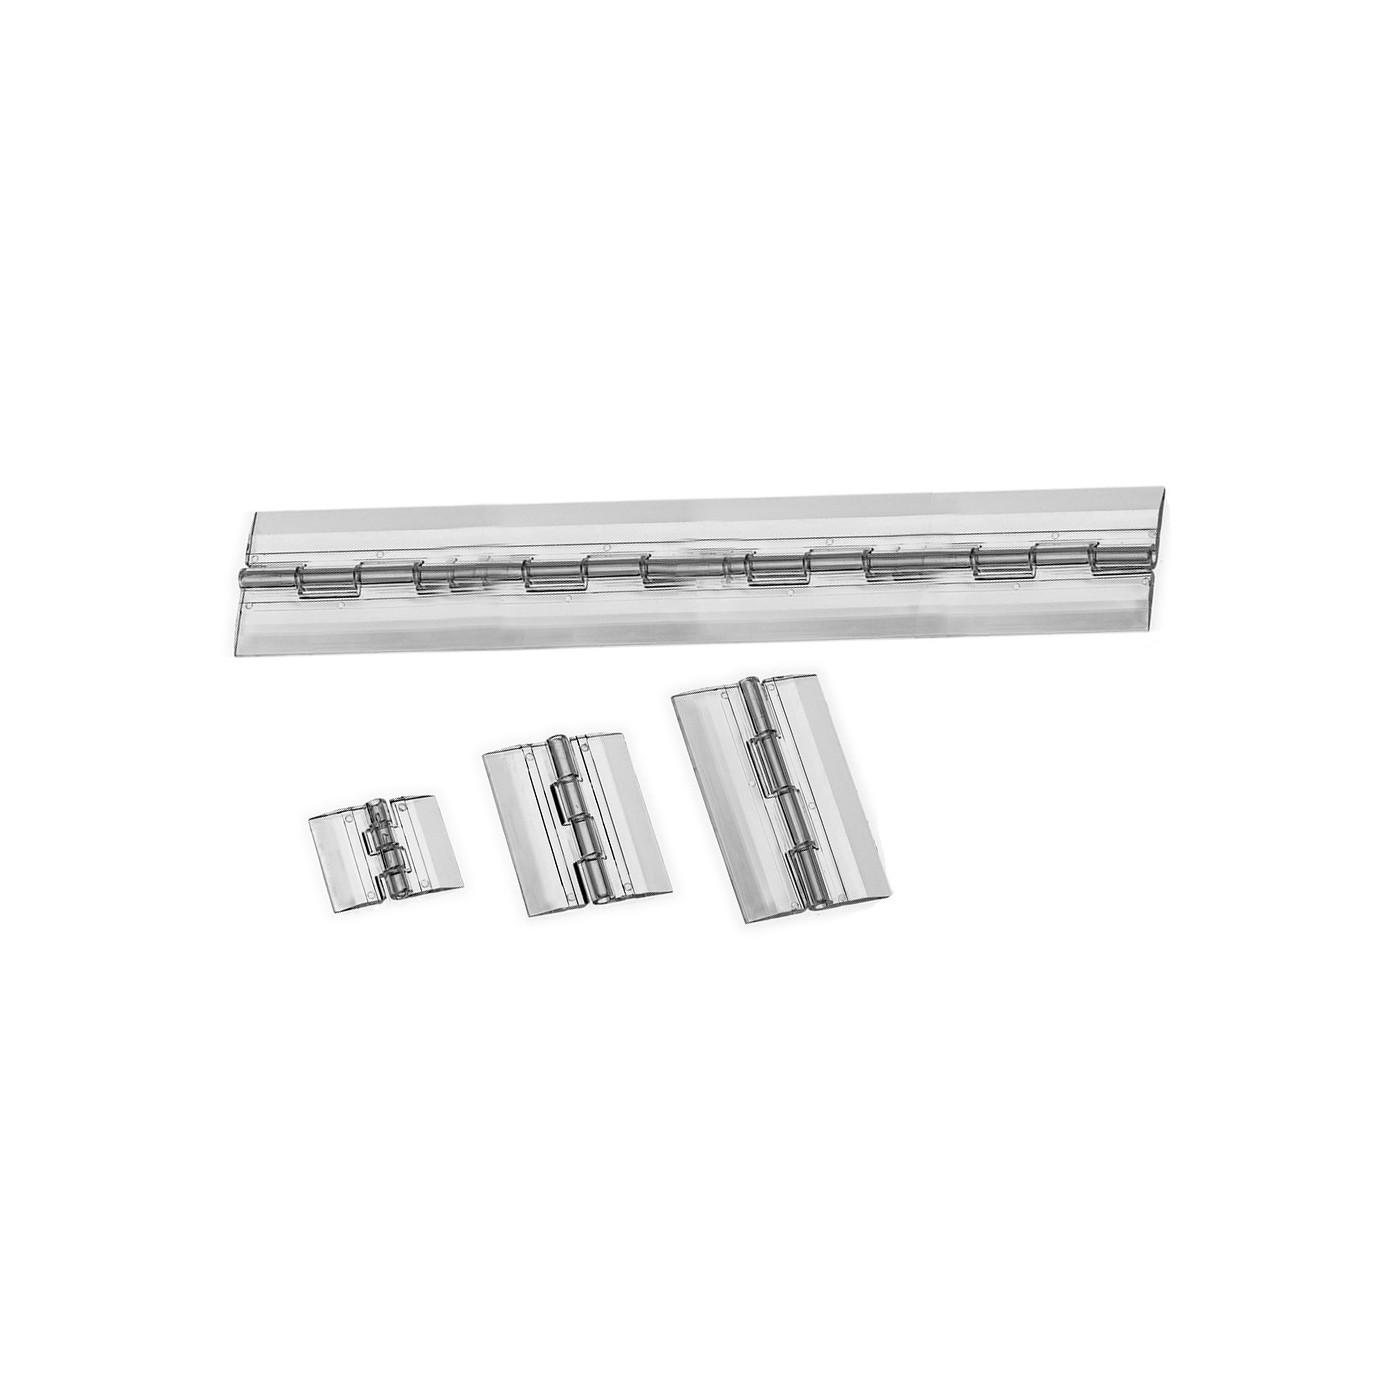 Set van 2 plastic scharnieren, transparant, 300x45 mm